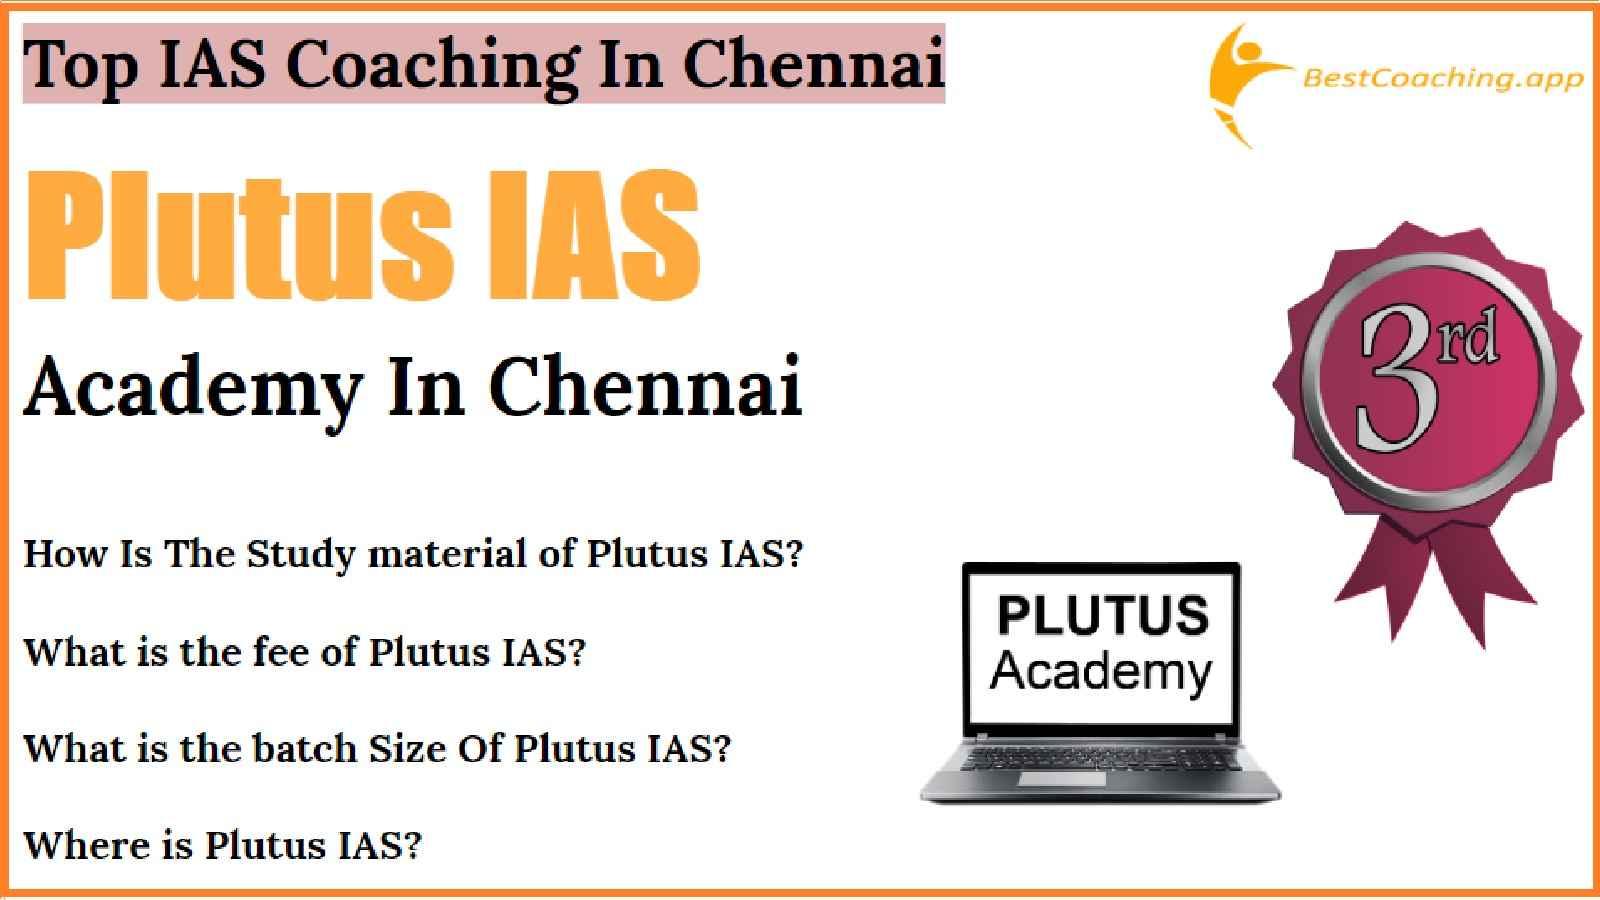 Best IAS Coaching Institute In Chennai